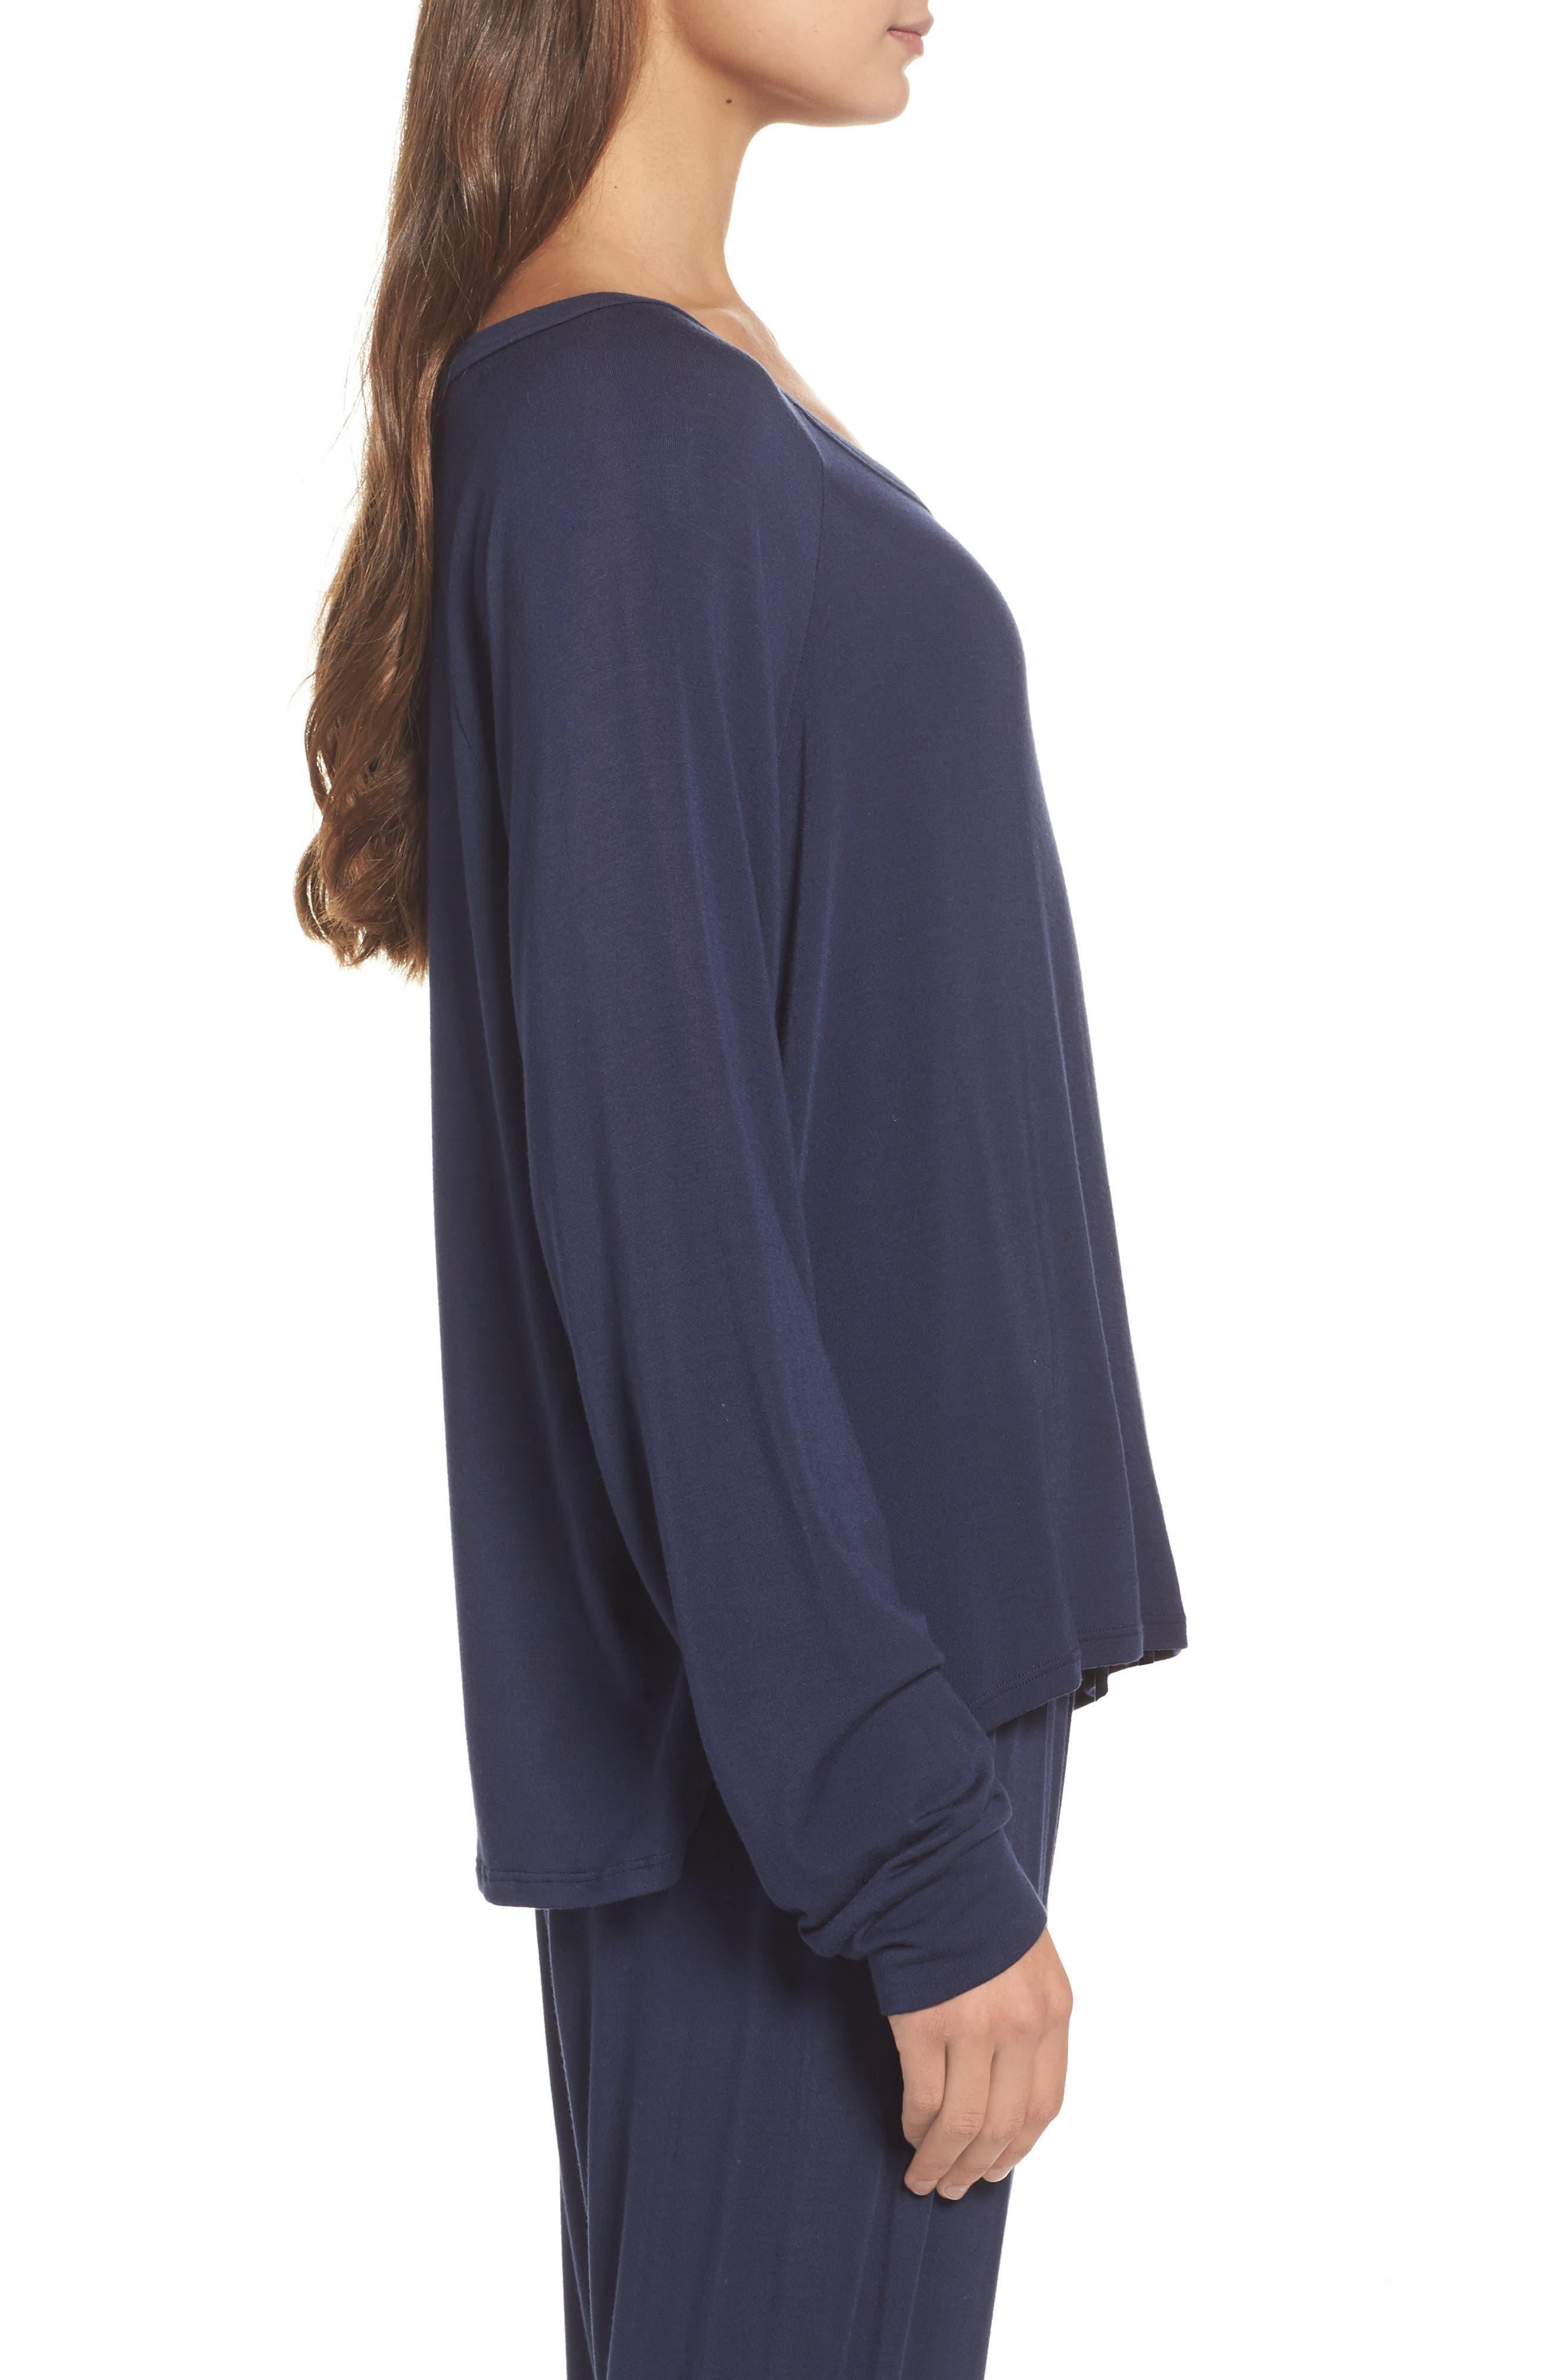 Amber Long Sleeve Top,                             Alternate thumbnail 3, color,